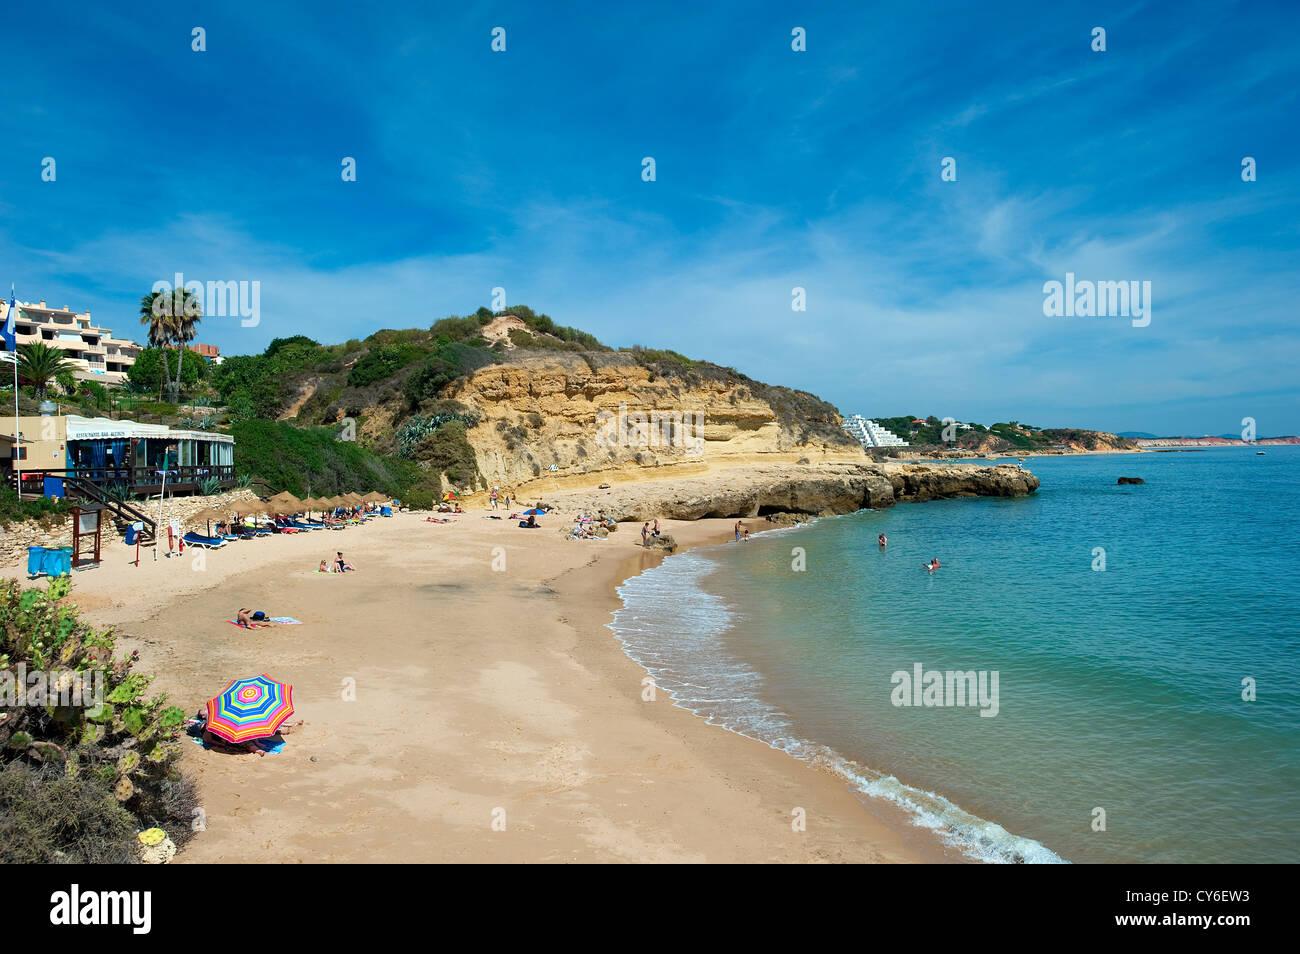 Praia dos Aveiros, Algarve, Portugal - Stock Image